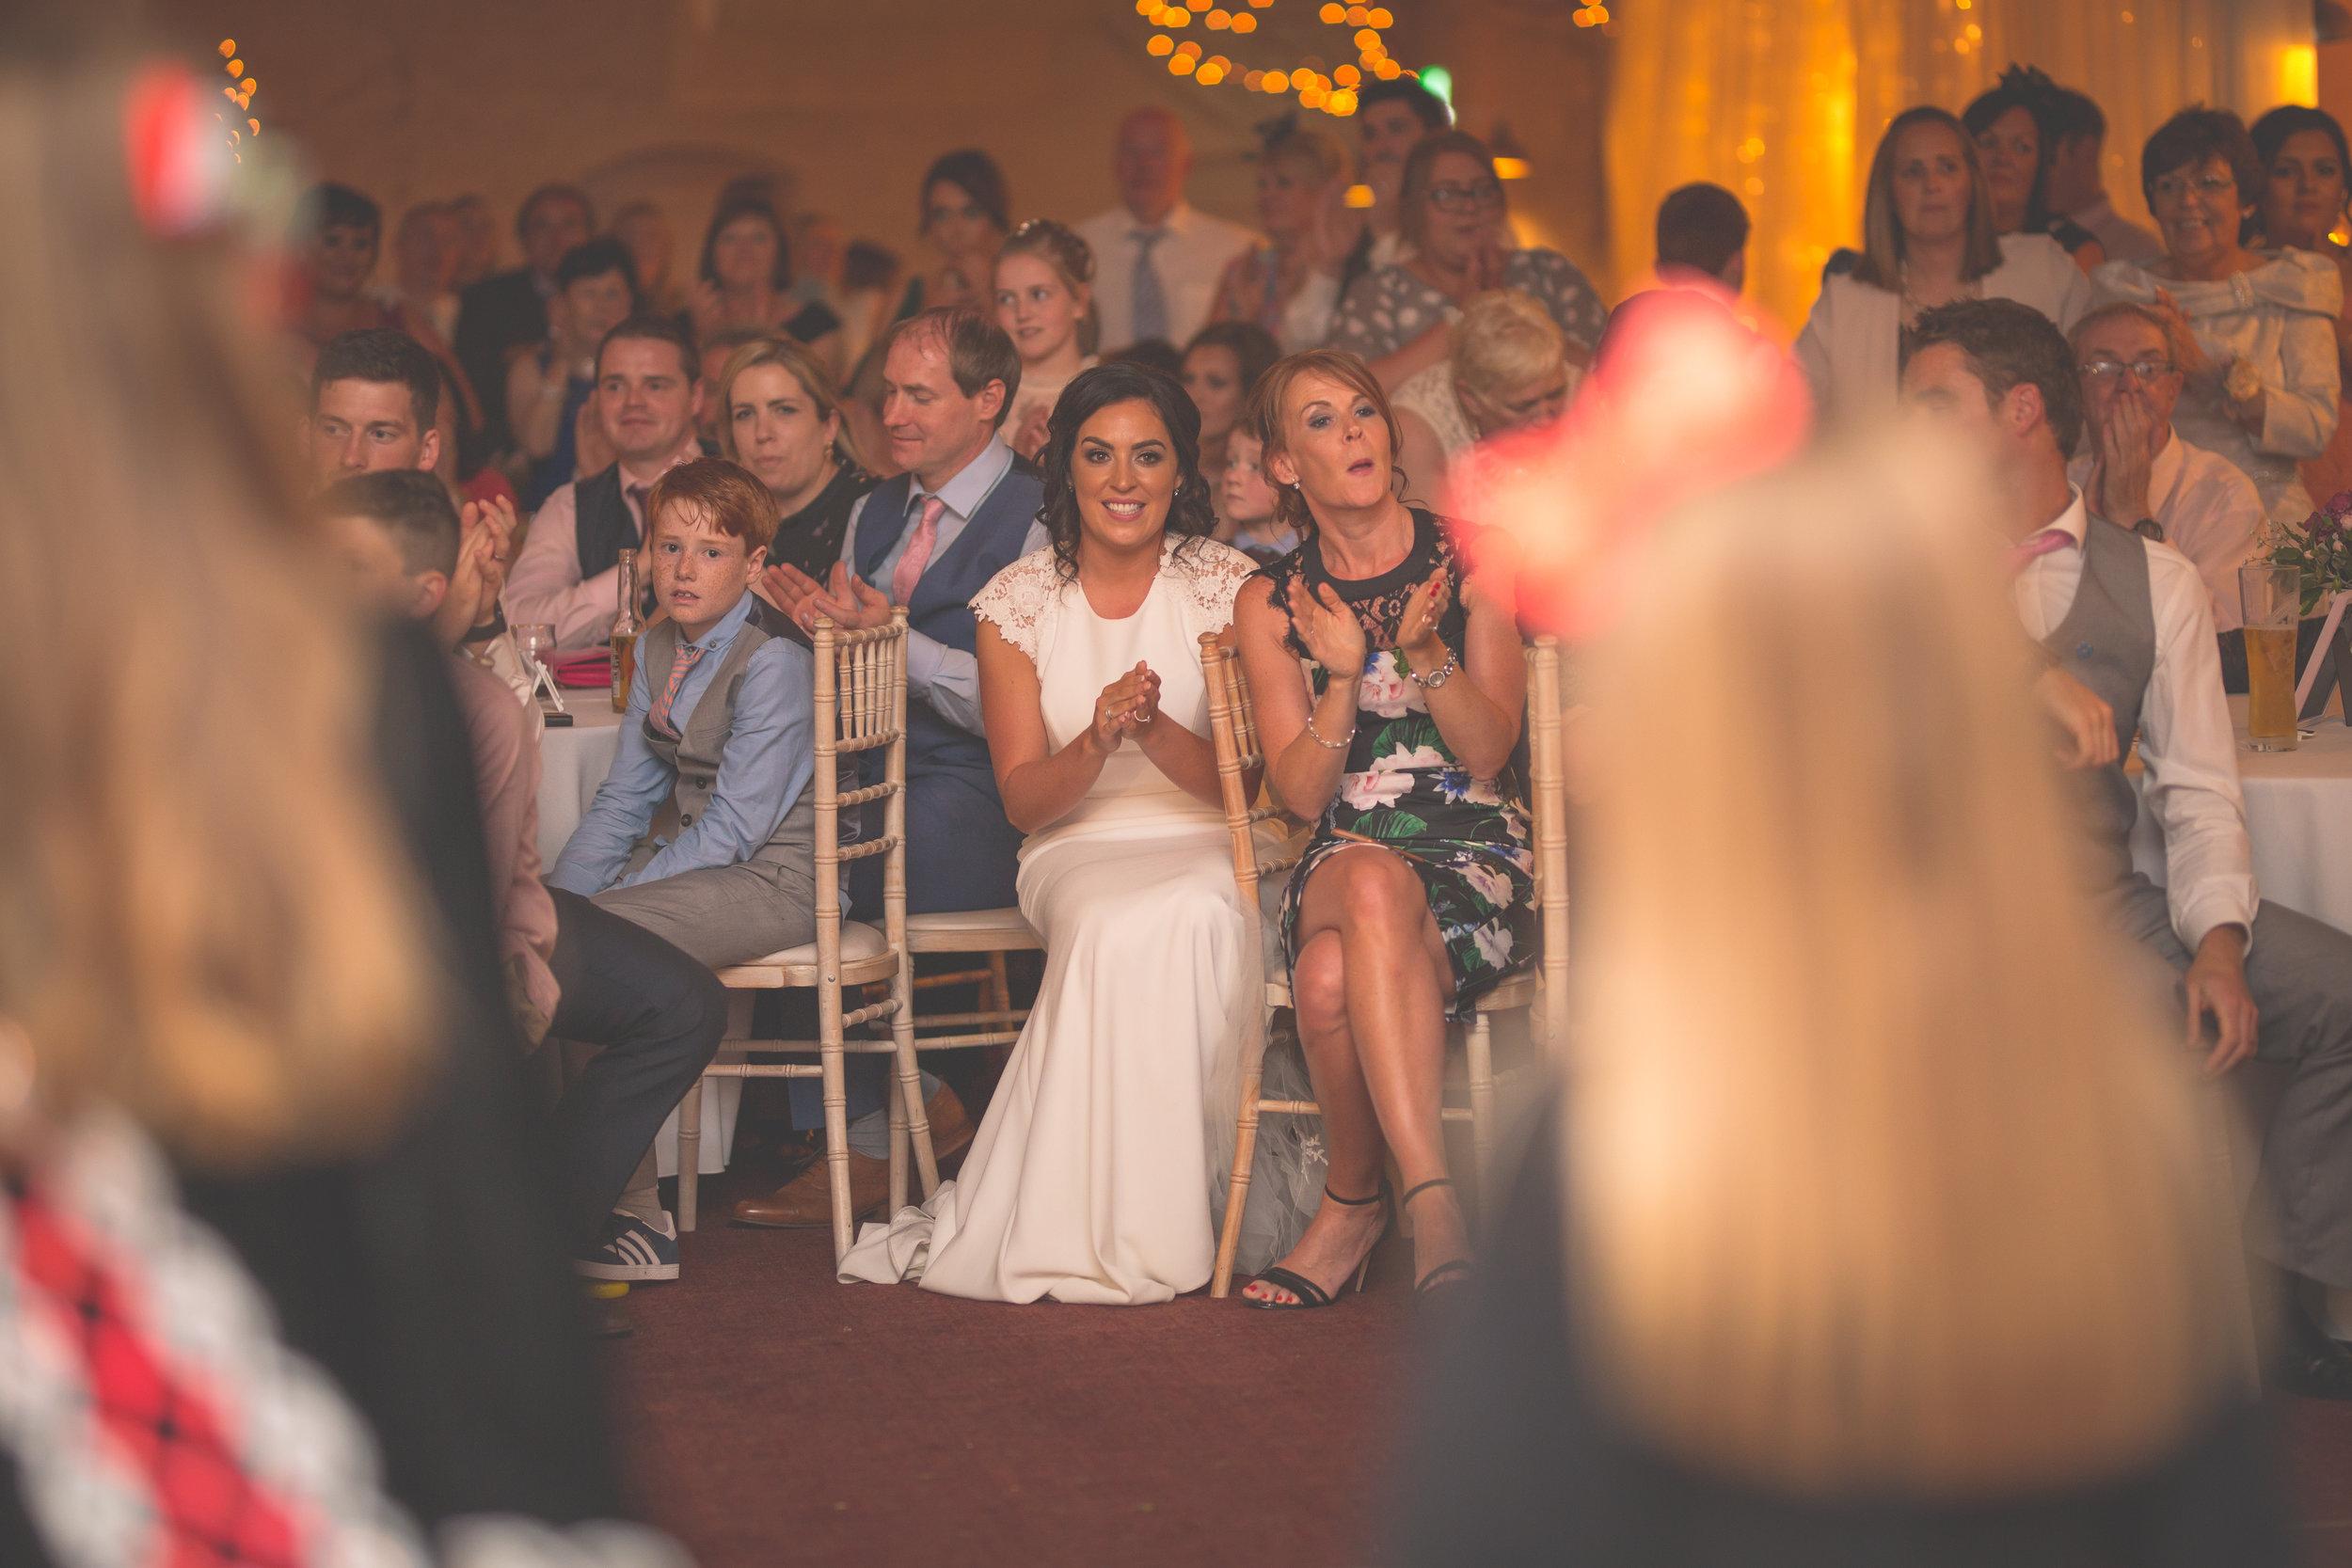 Brian McEwan Wedding Photography | Carol-Annee & Sean | The Dancing-9.jpg